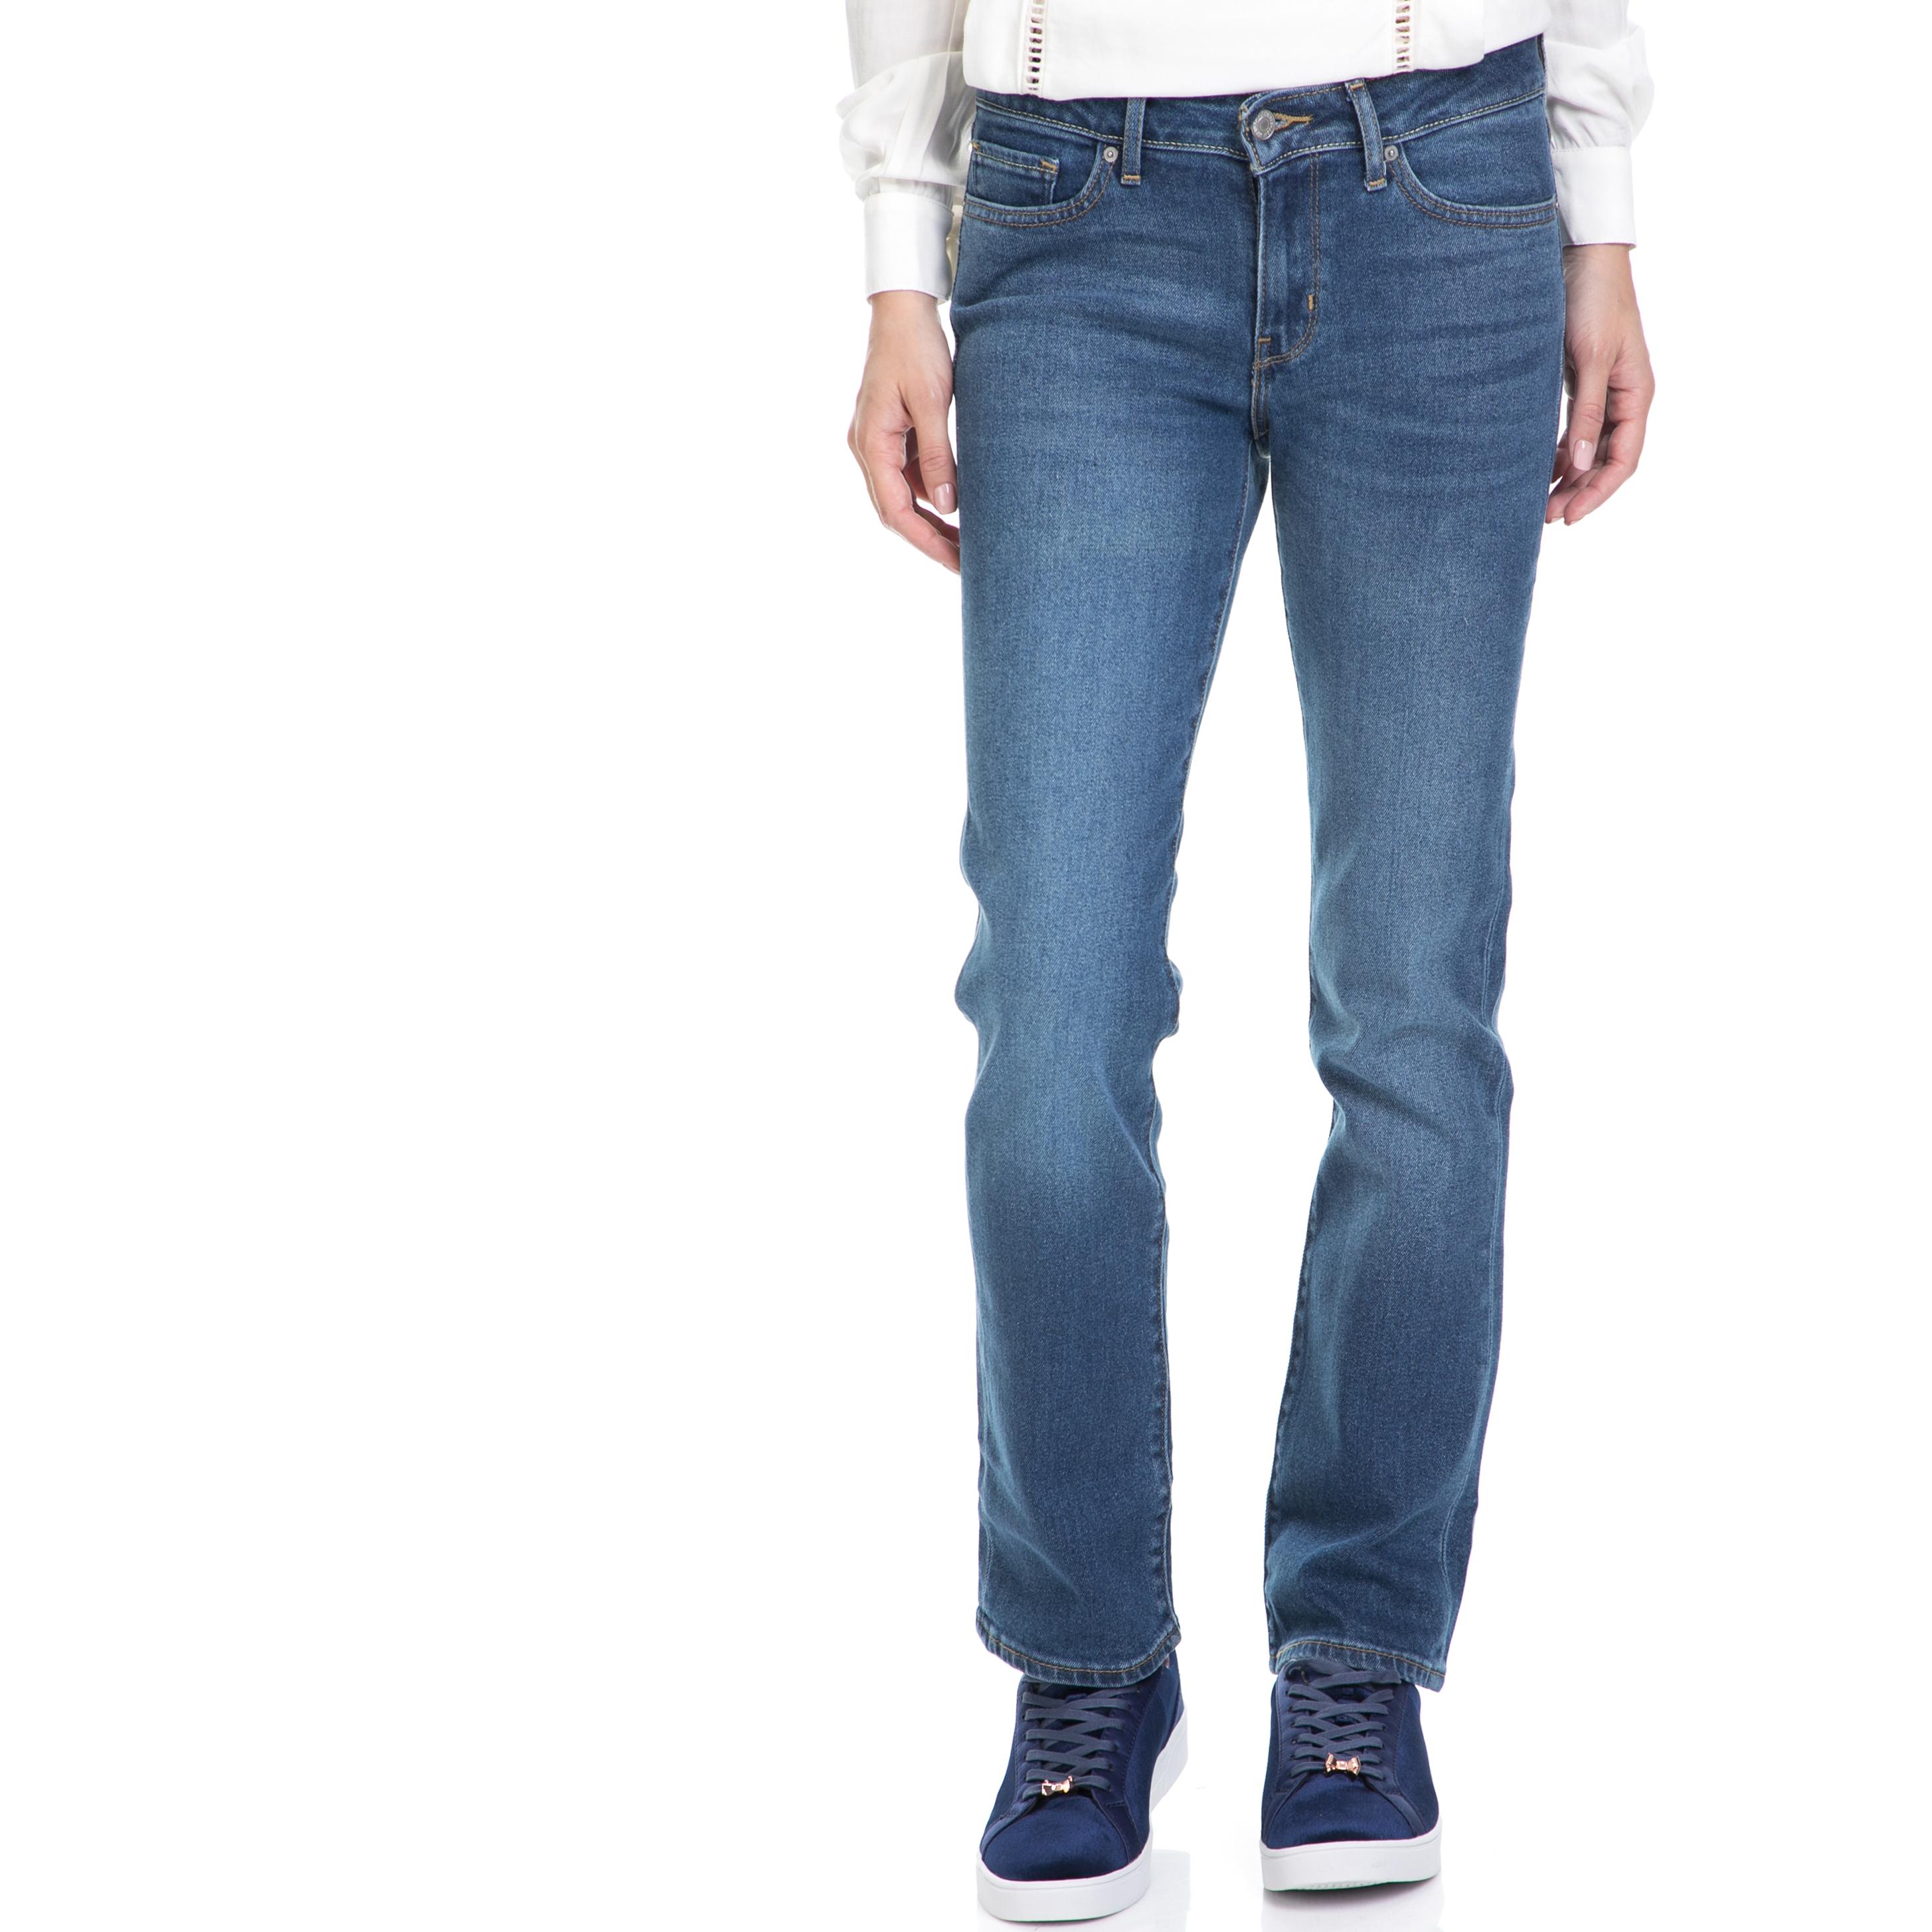 LEVIS – Γυναικείο τζιν παντελόνι 714 STRAIGHT AIRWAVES LEVI'S μπλε